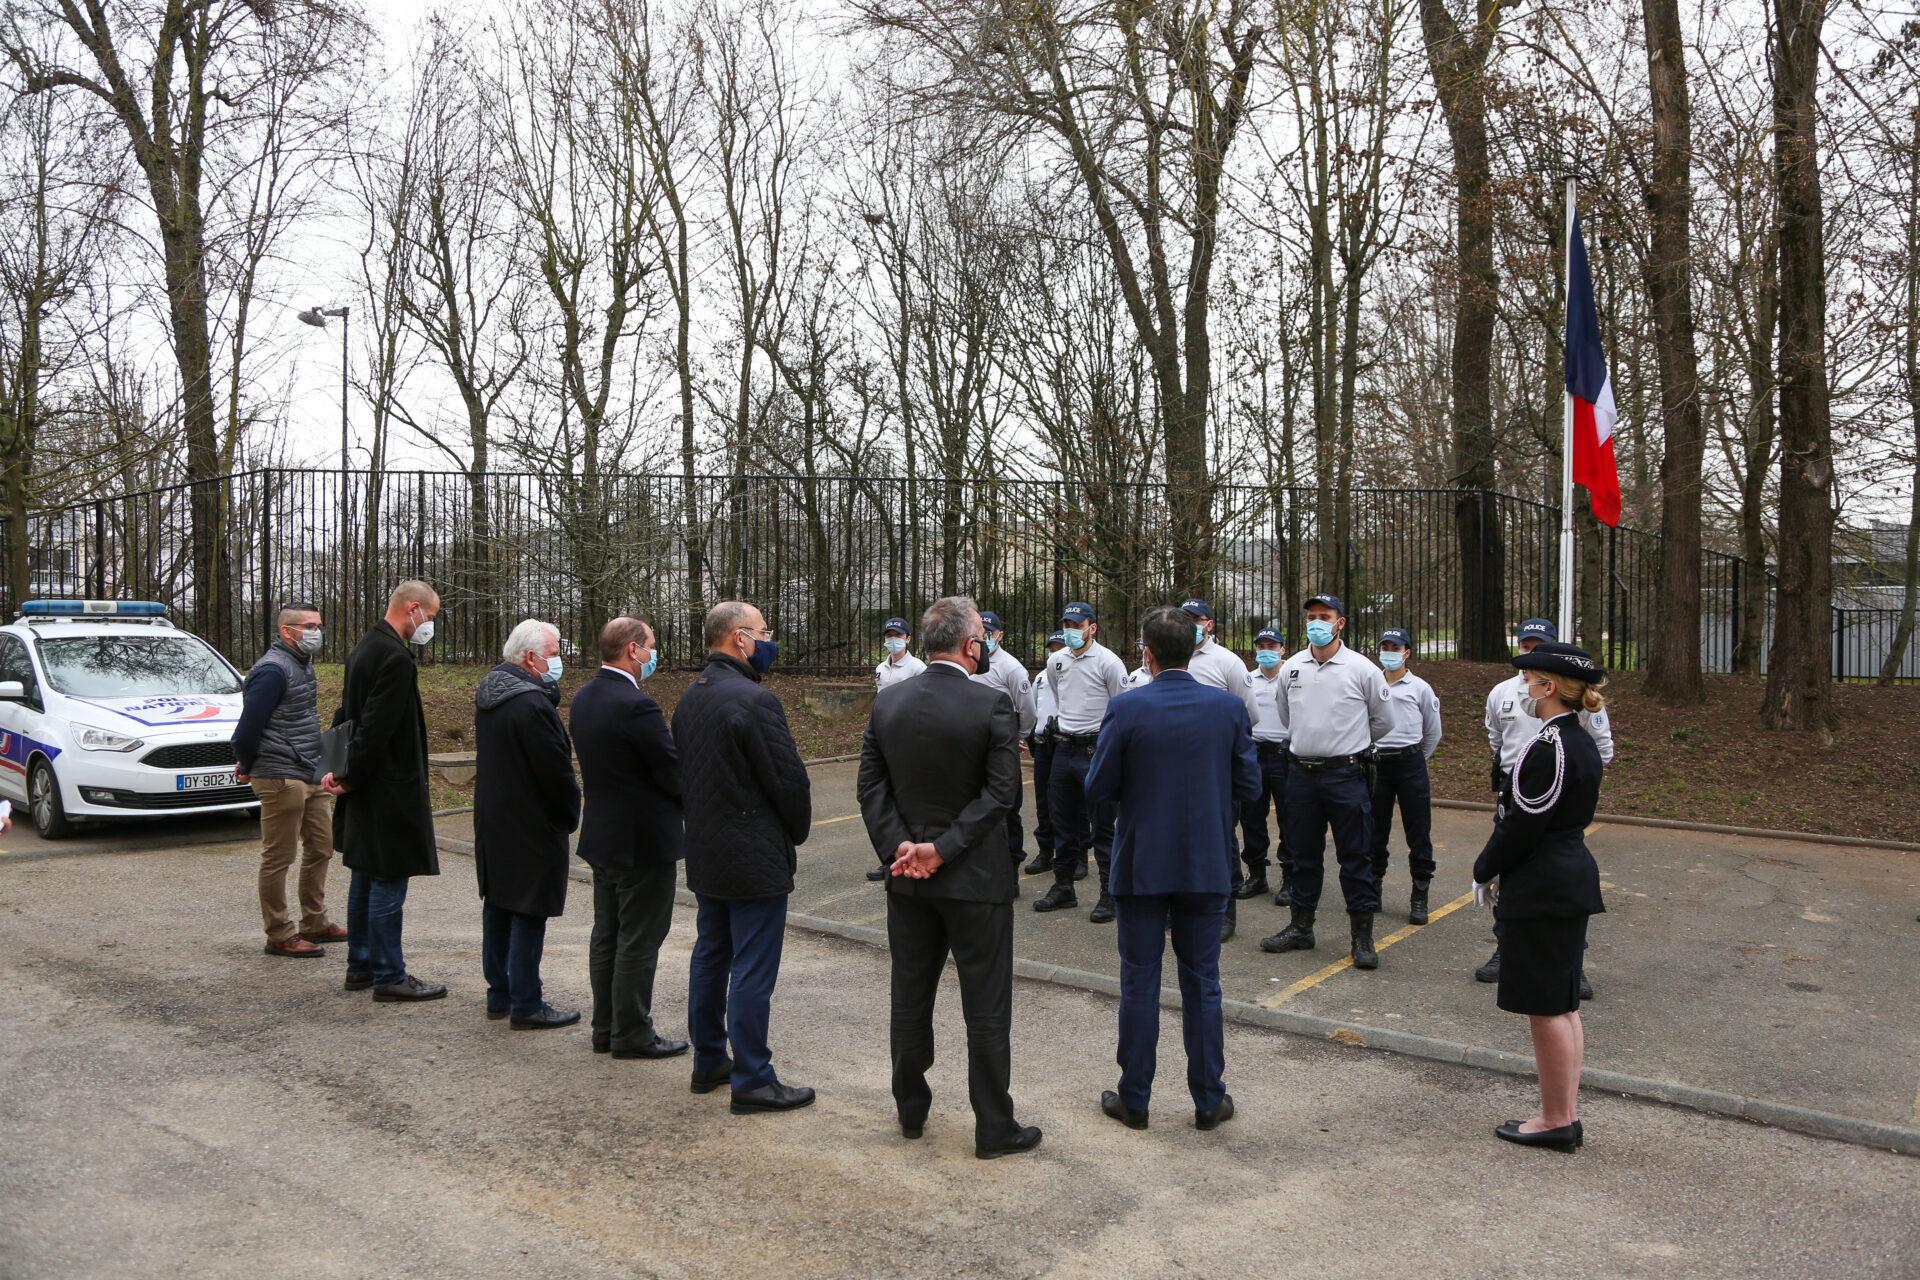 10 nouvelles recrues au commissariat de Val-de-Reuil !